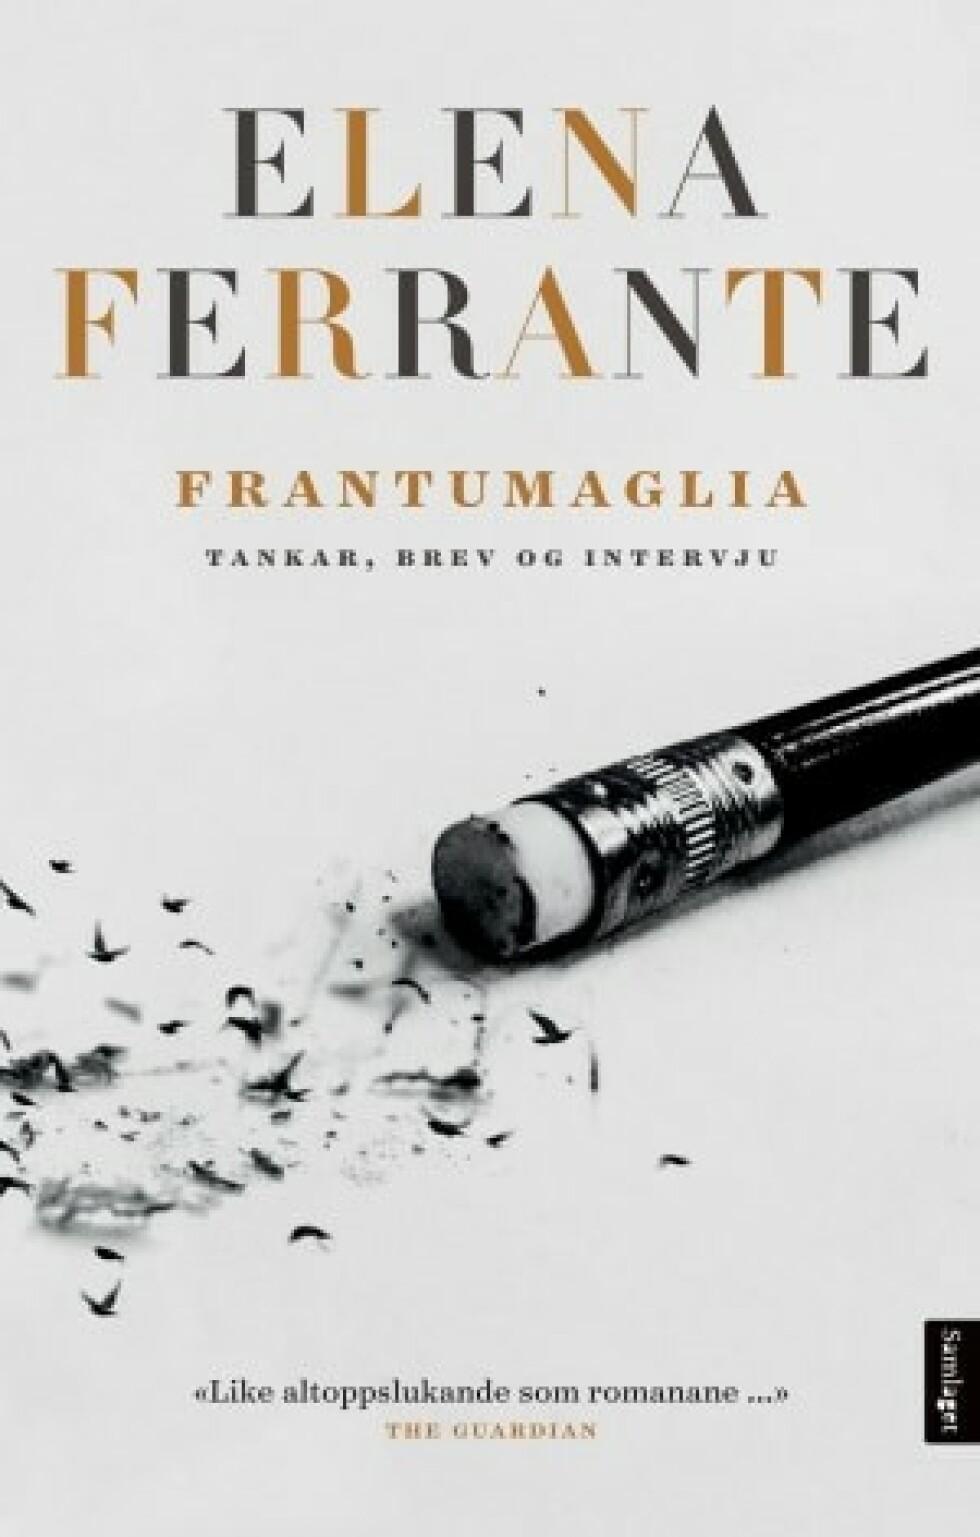 Elena Ferrante |Frantumaglia| https://www.ark.no/boker/Elena-Ferrante-Frantumaglia-9788252197174